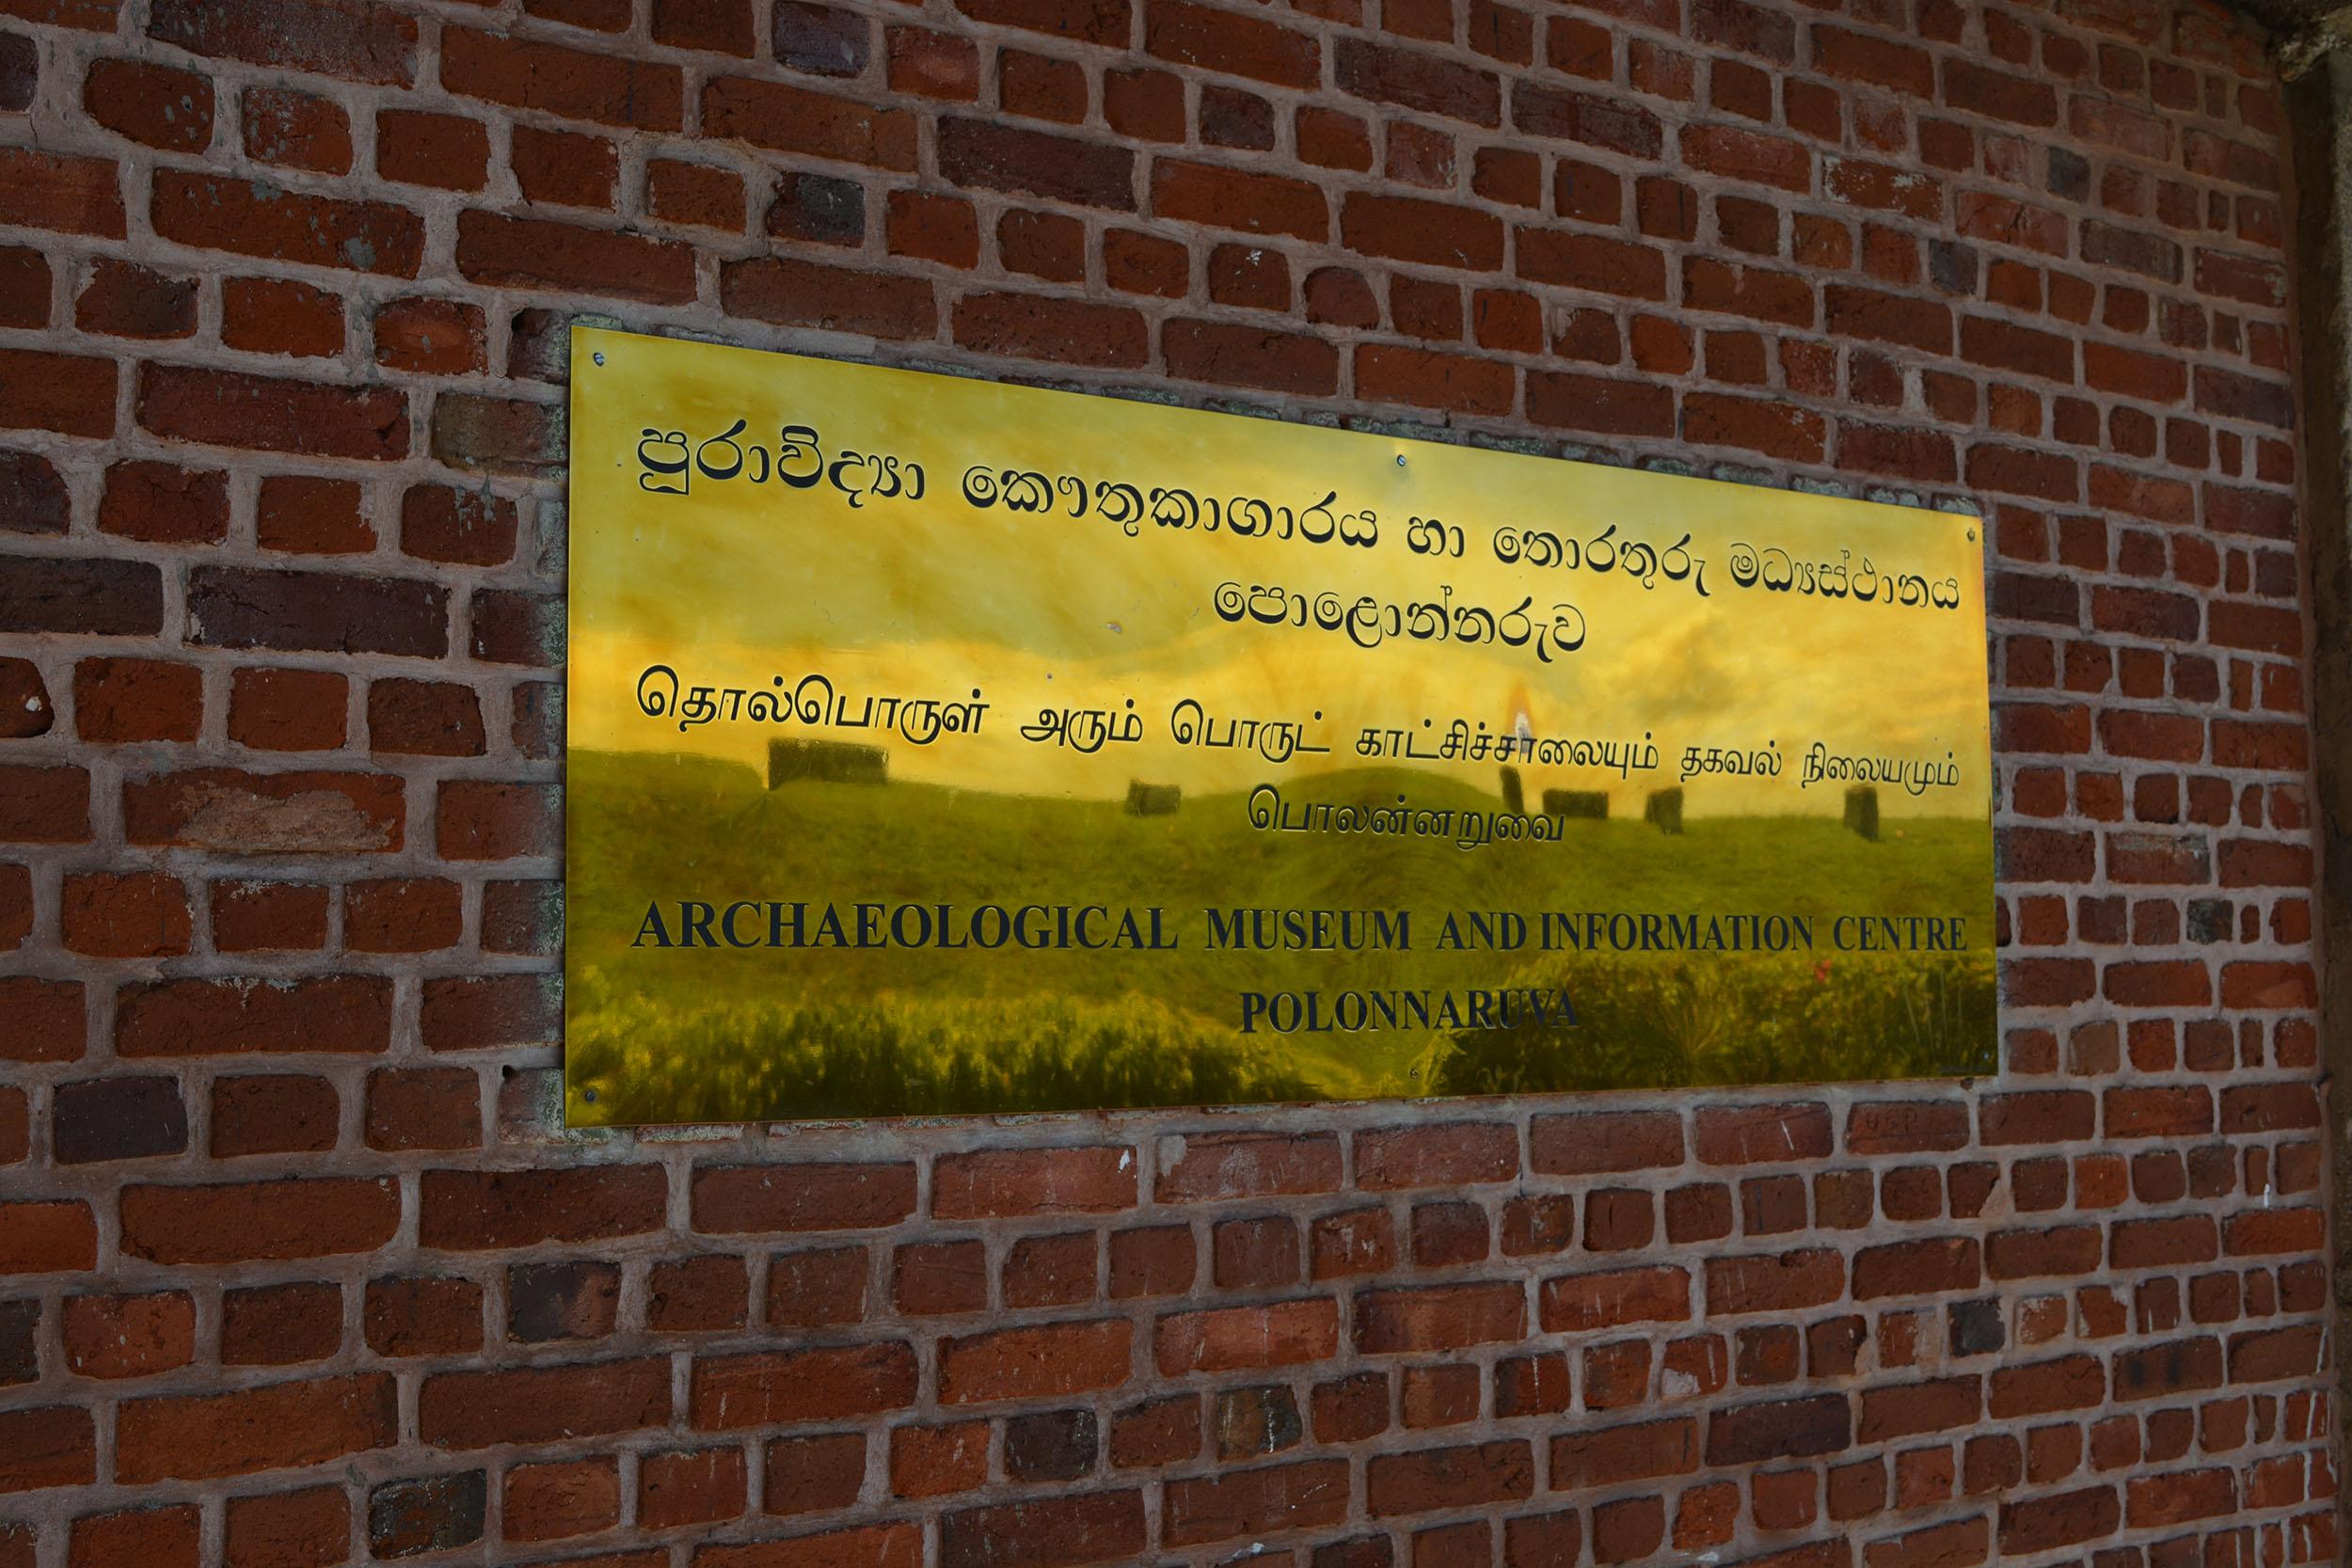 Three main languages in Sri Lanka - Sinhalese, Tamil and English